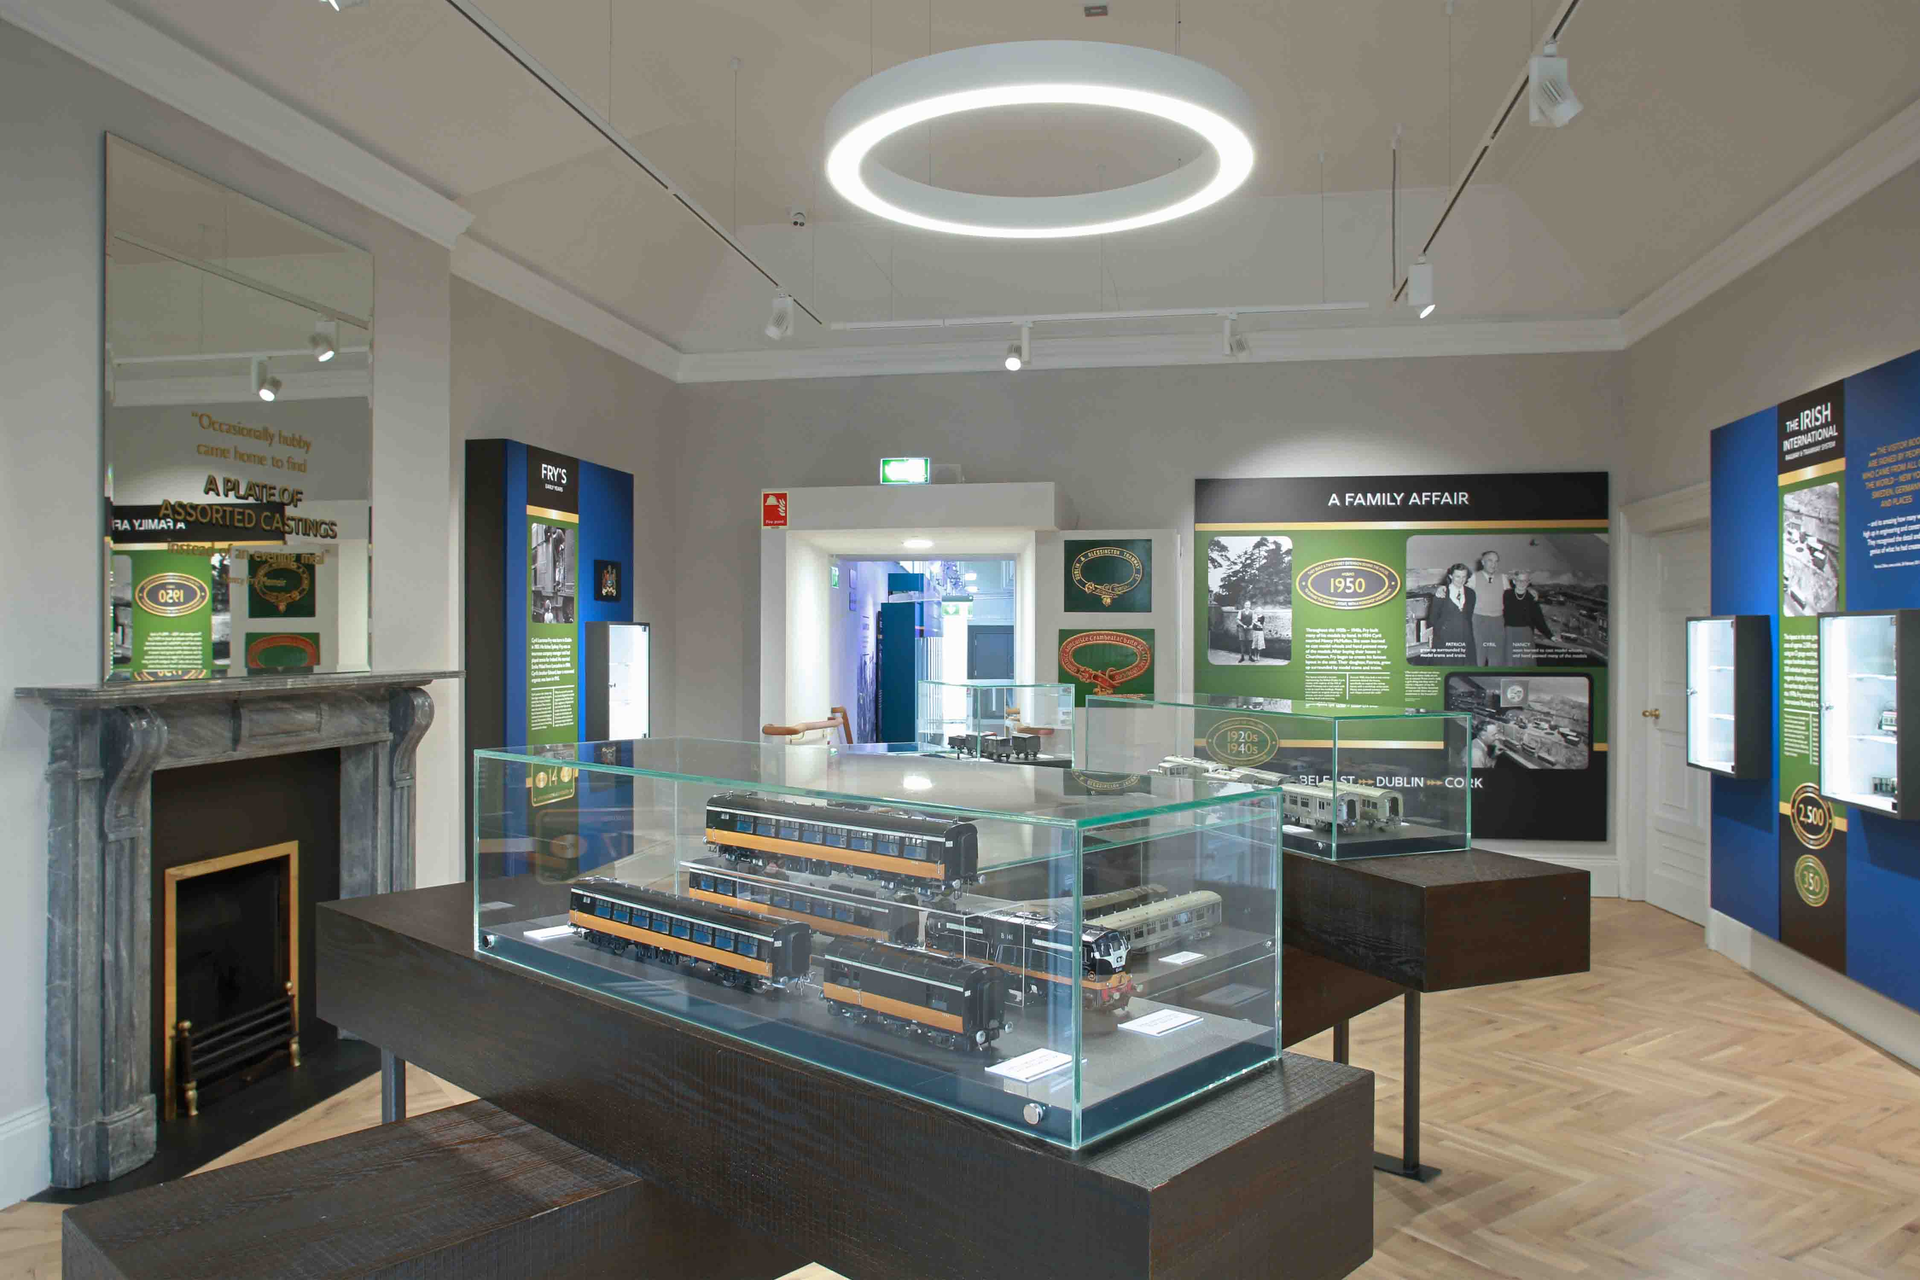 Fry Model Railway Museum (6)